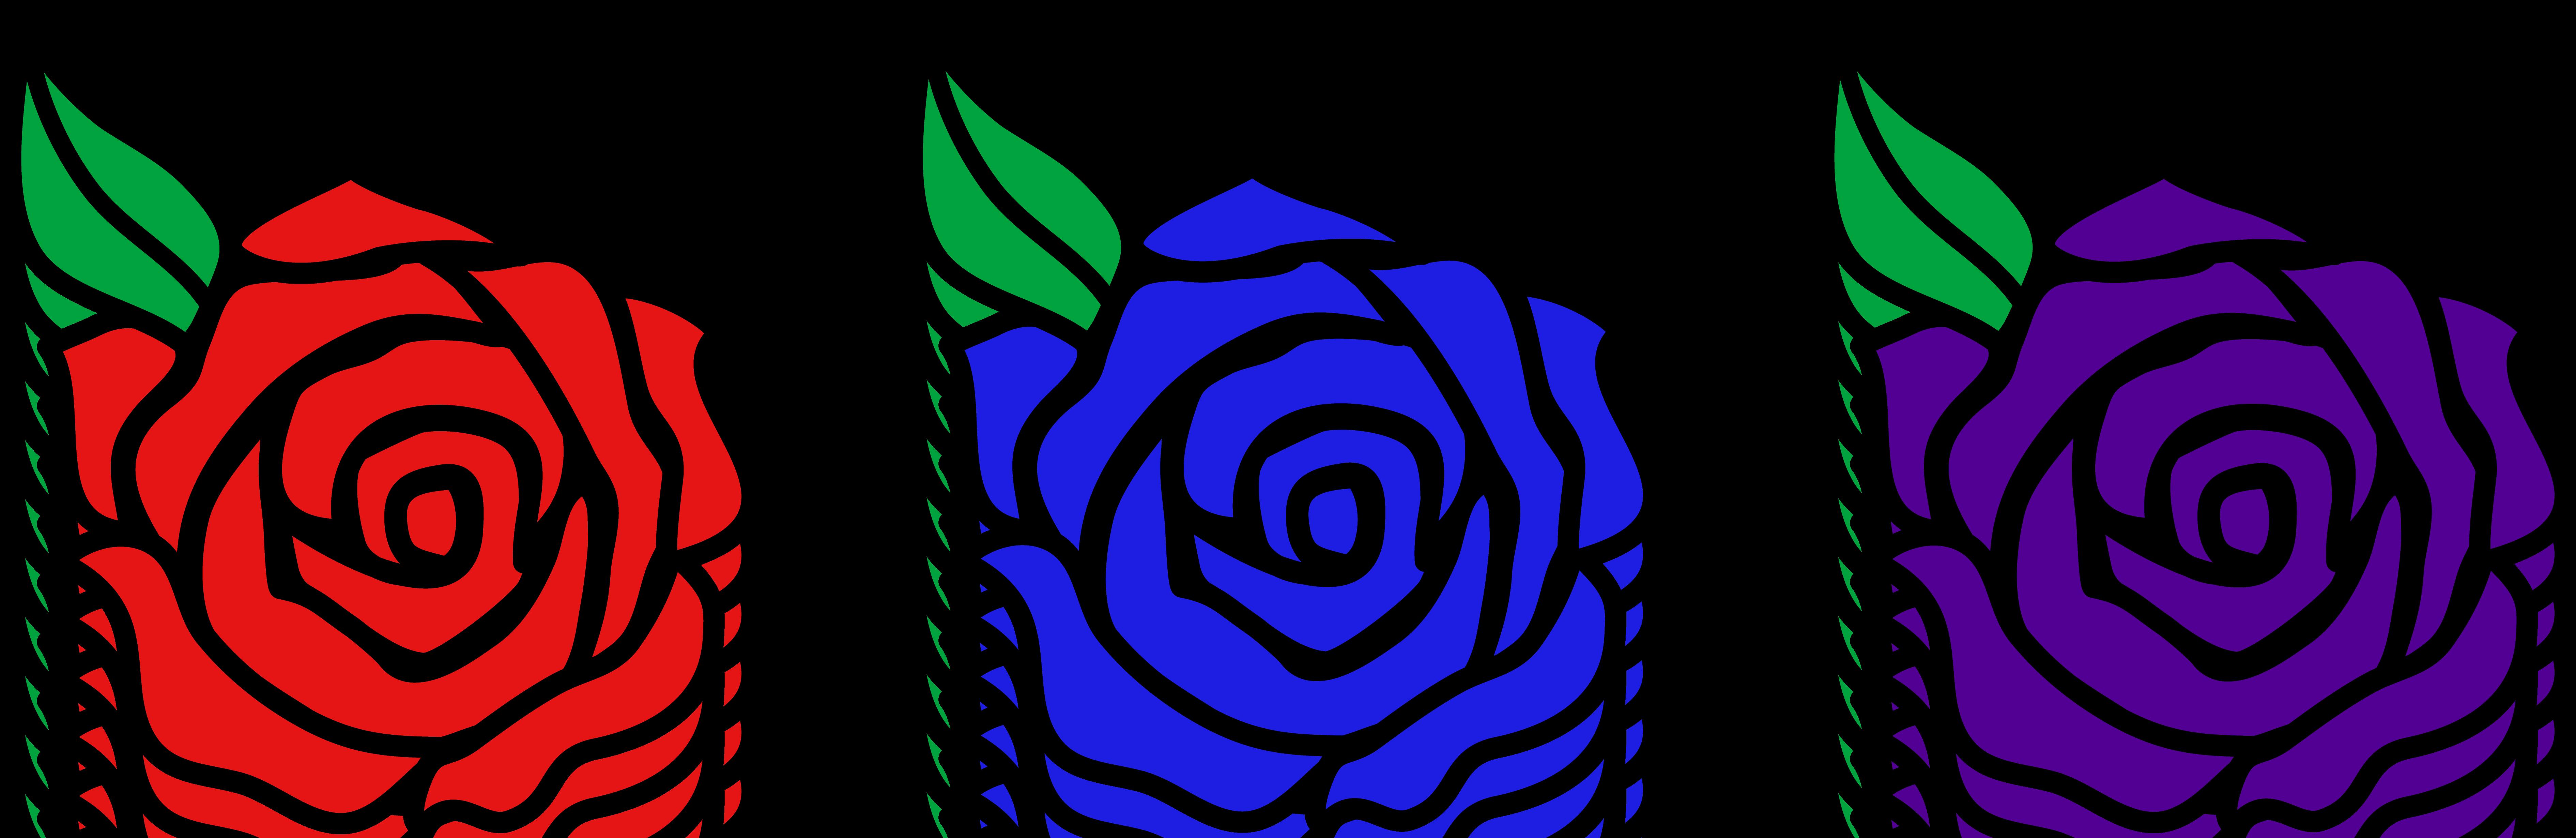 7560x2458 Cartoon Rose Images